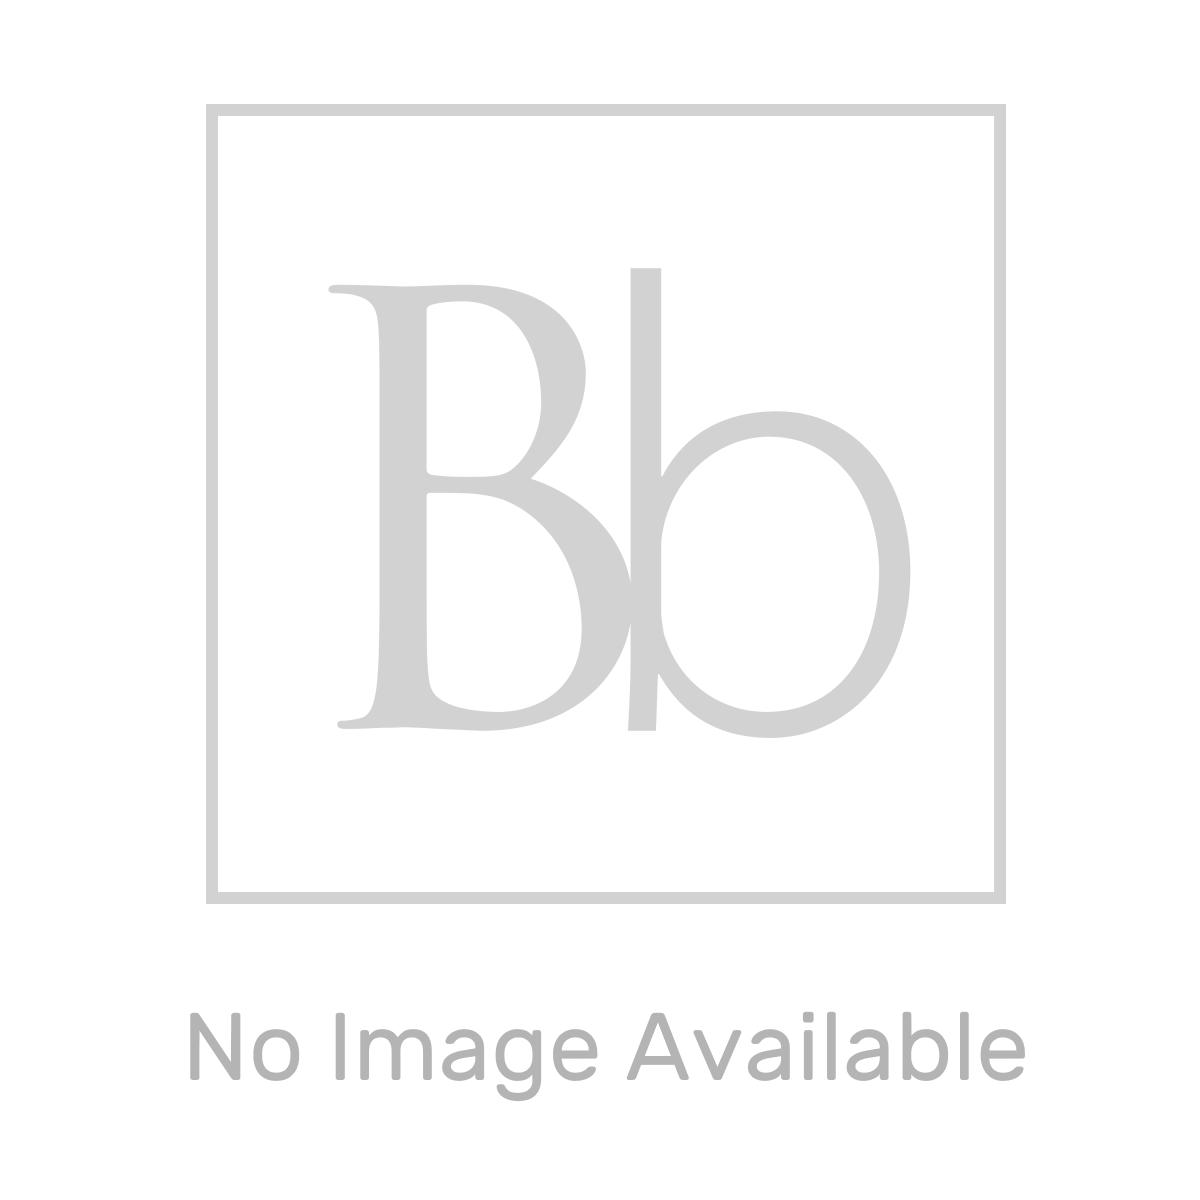 Stuart Turner 46553 CH 4-30 Centrifugal Multistage 2.5 Bar Pump Back